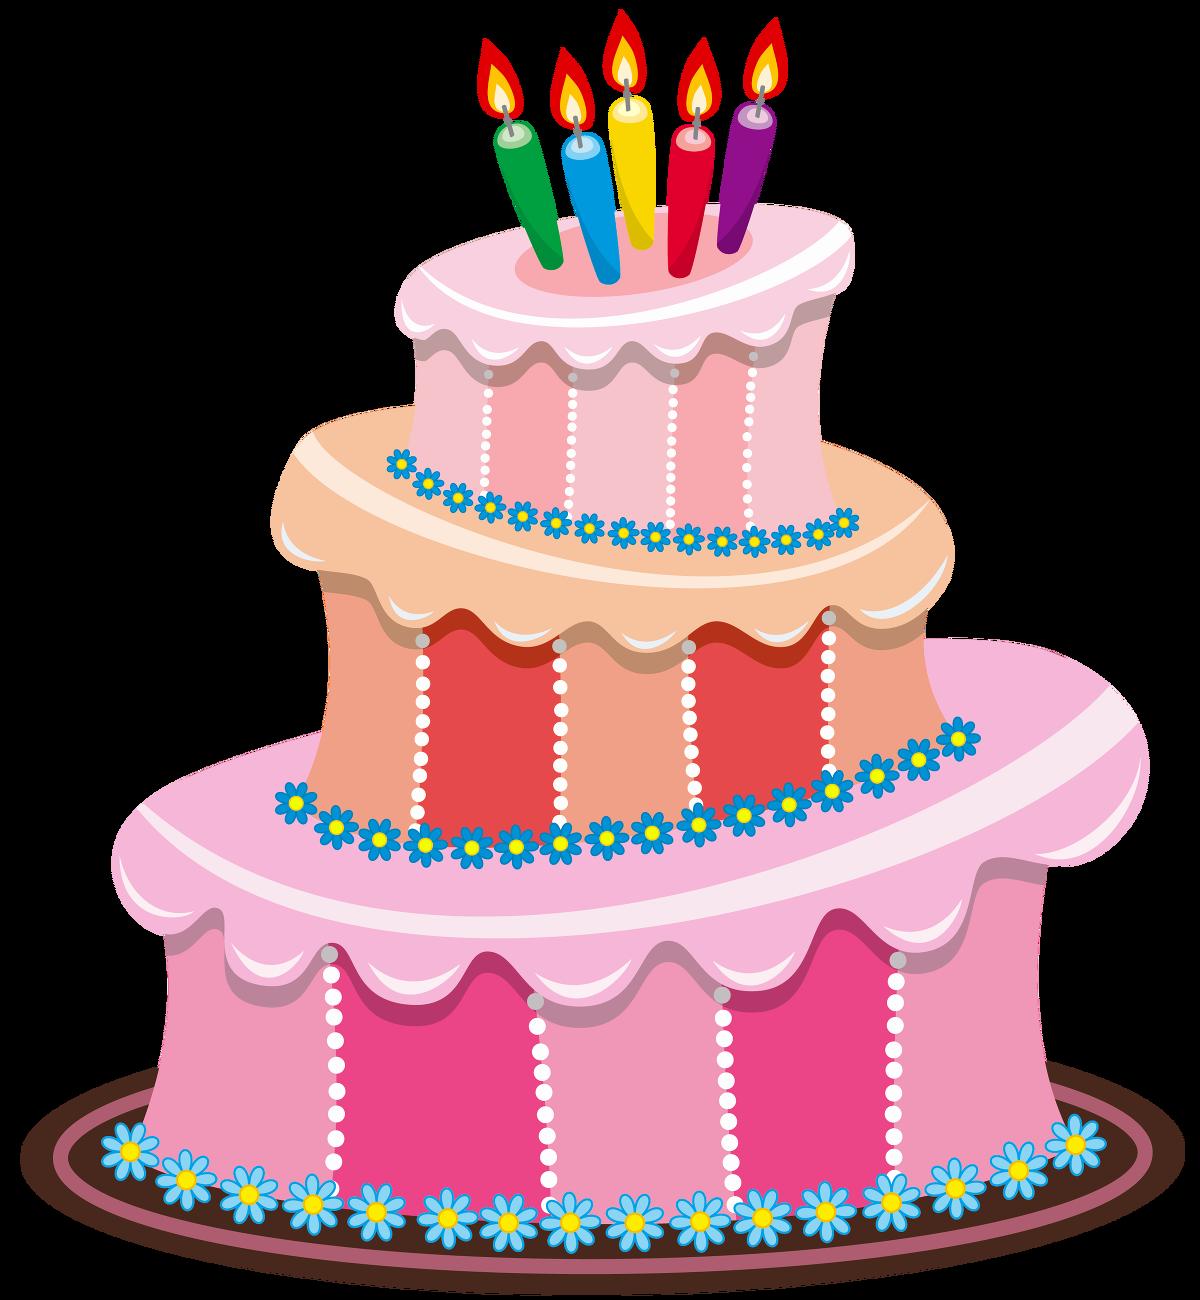 Clipart cake january. Birthday present my th